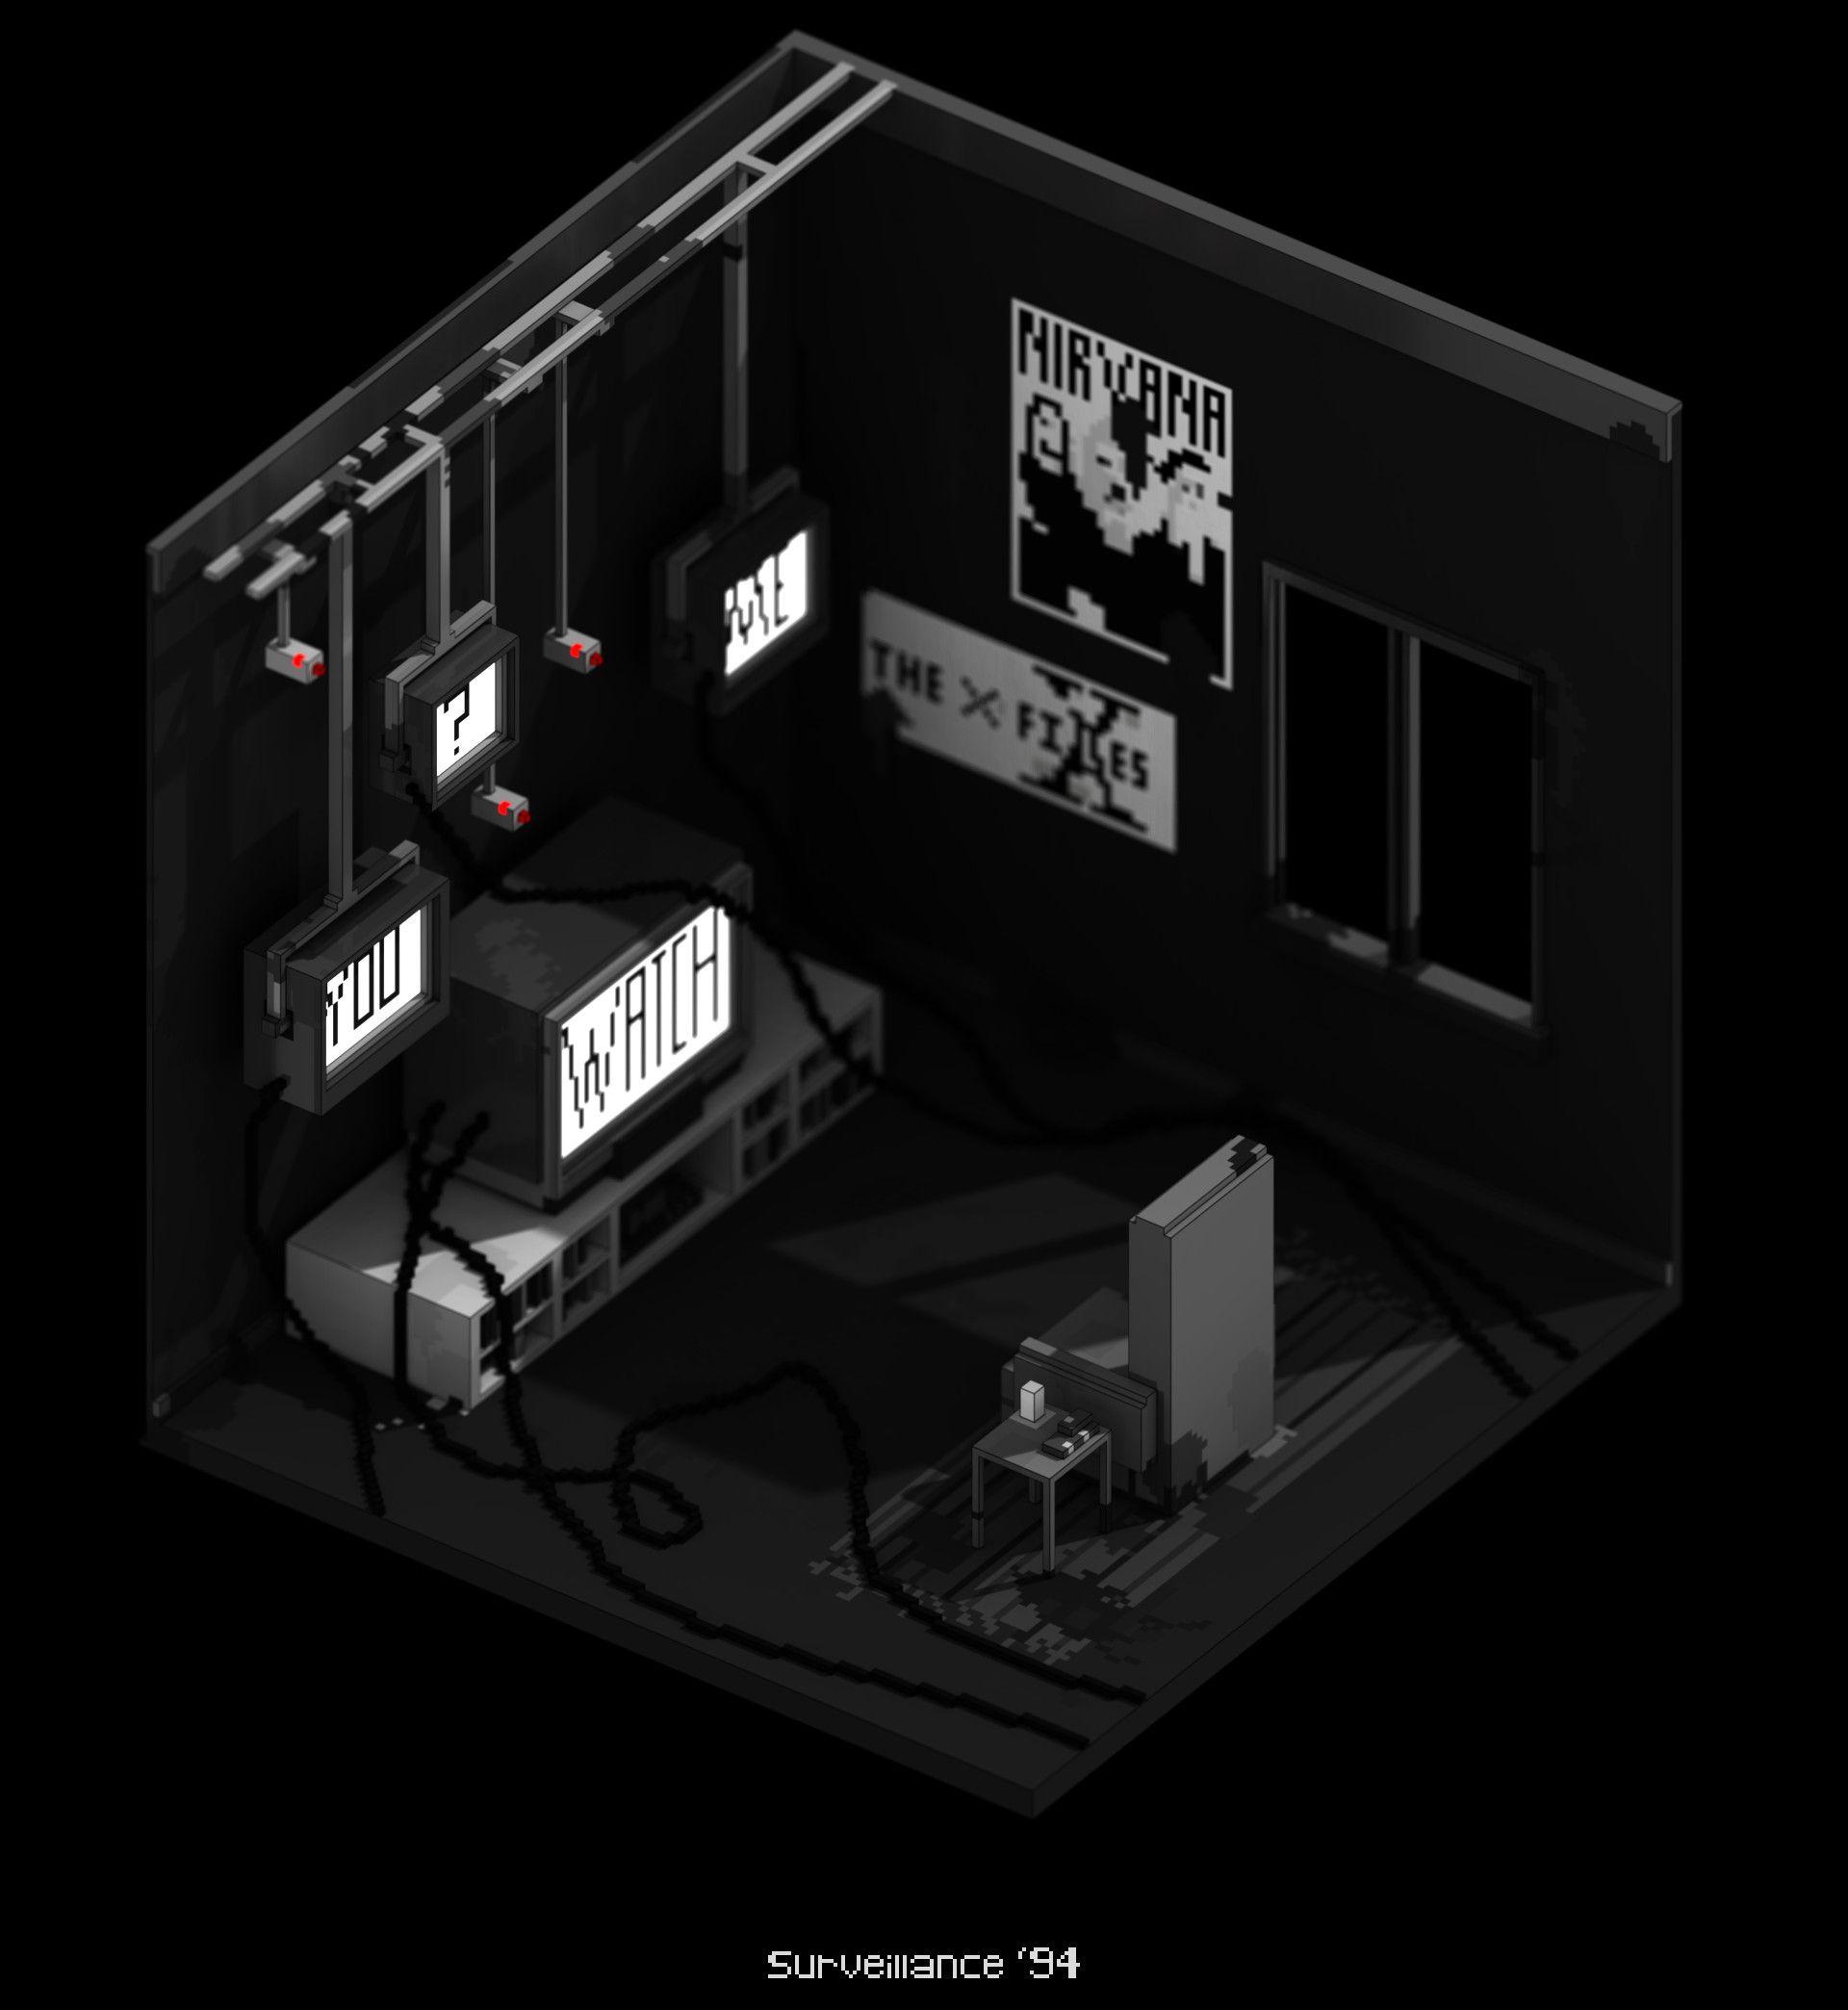 ArtStation - Mini Environments, Benjamin Nicholas